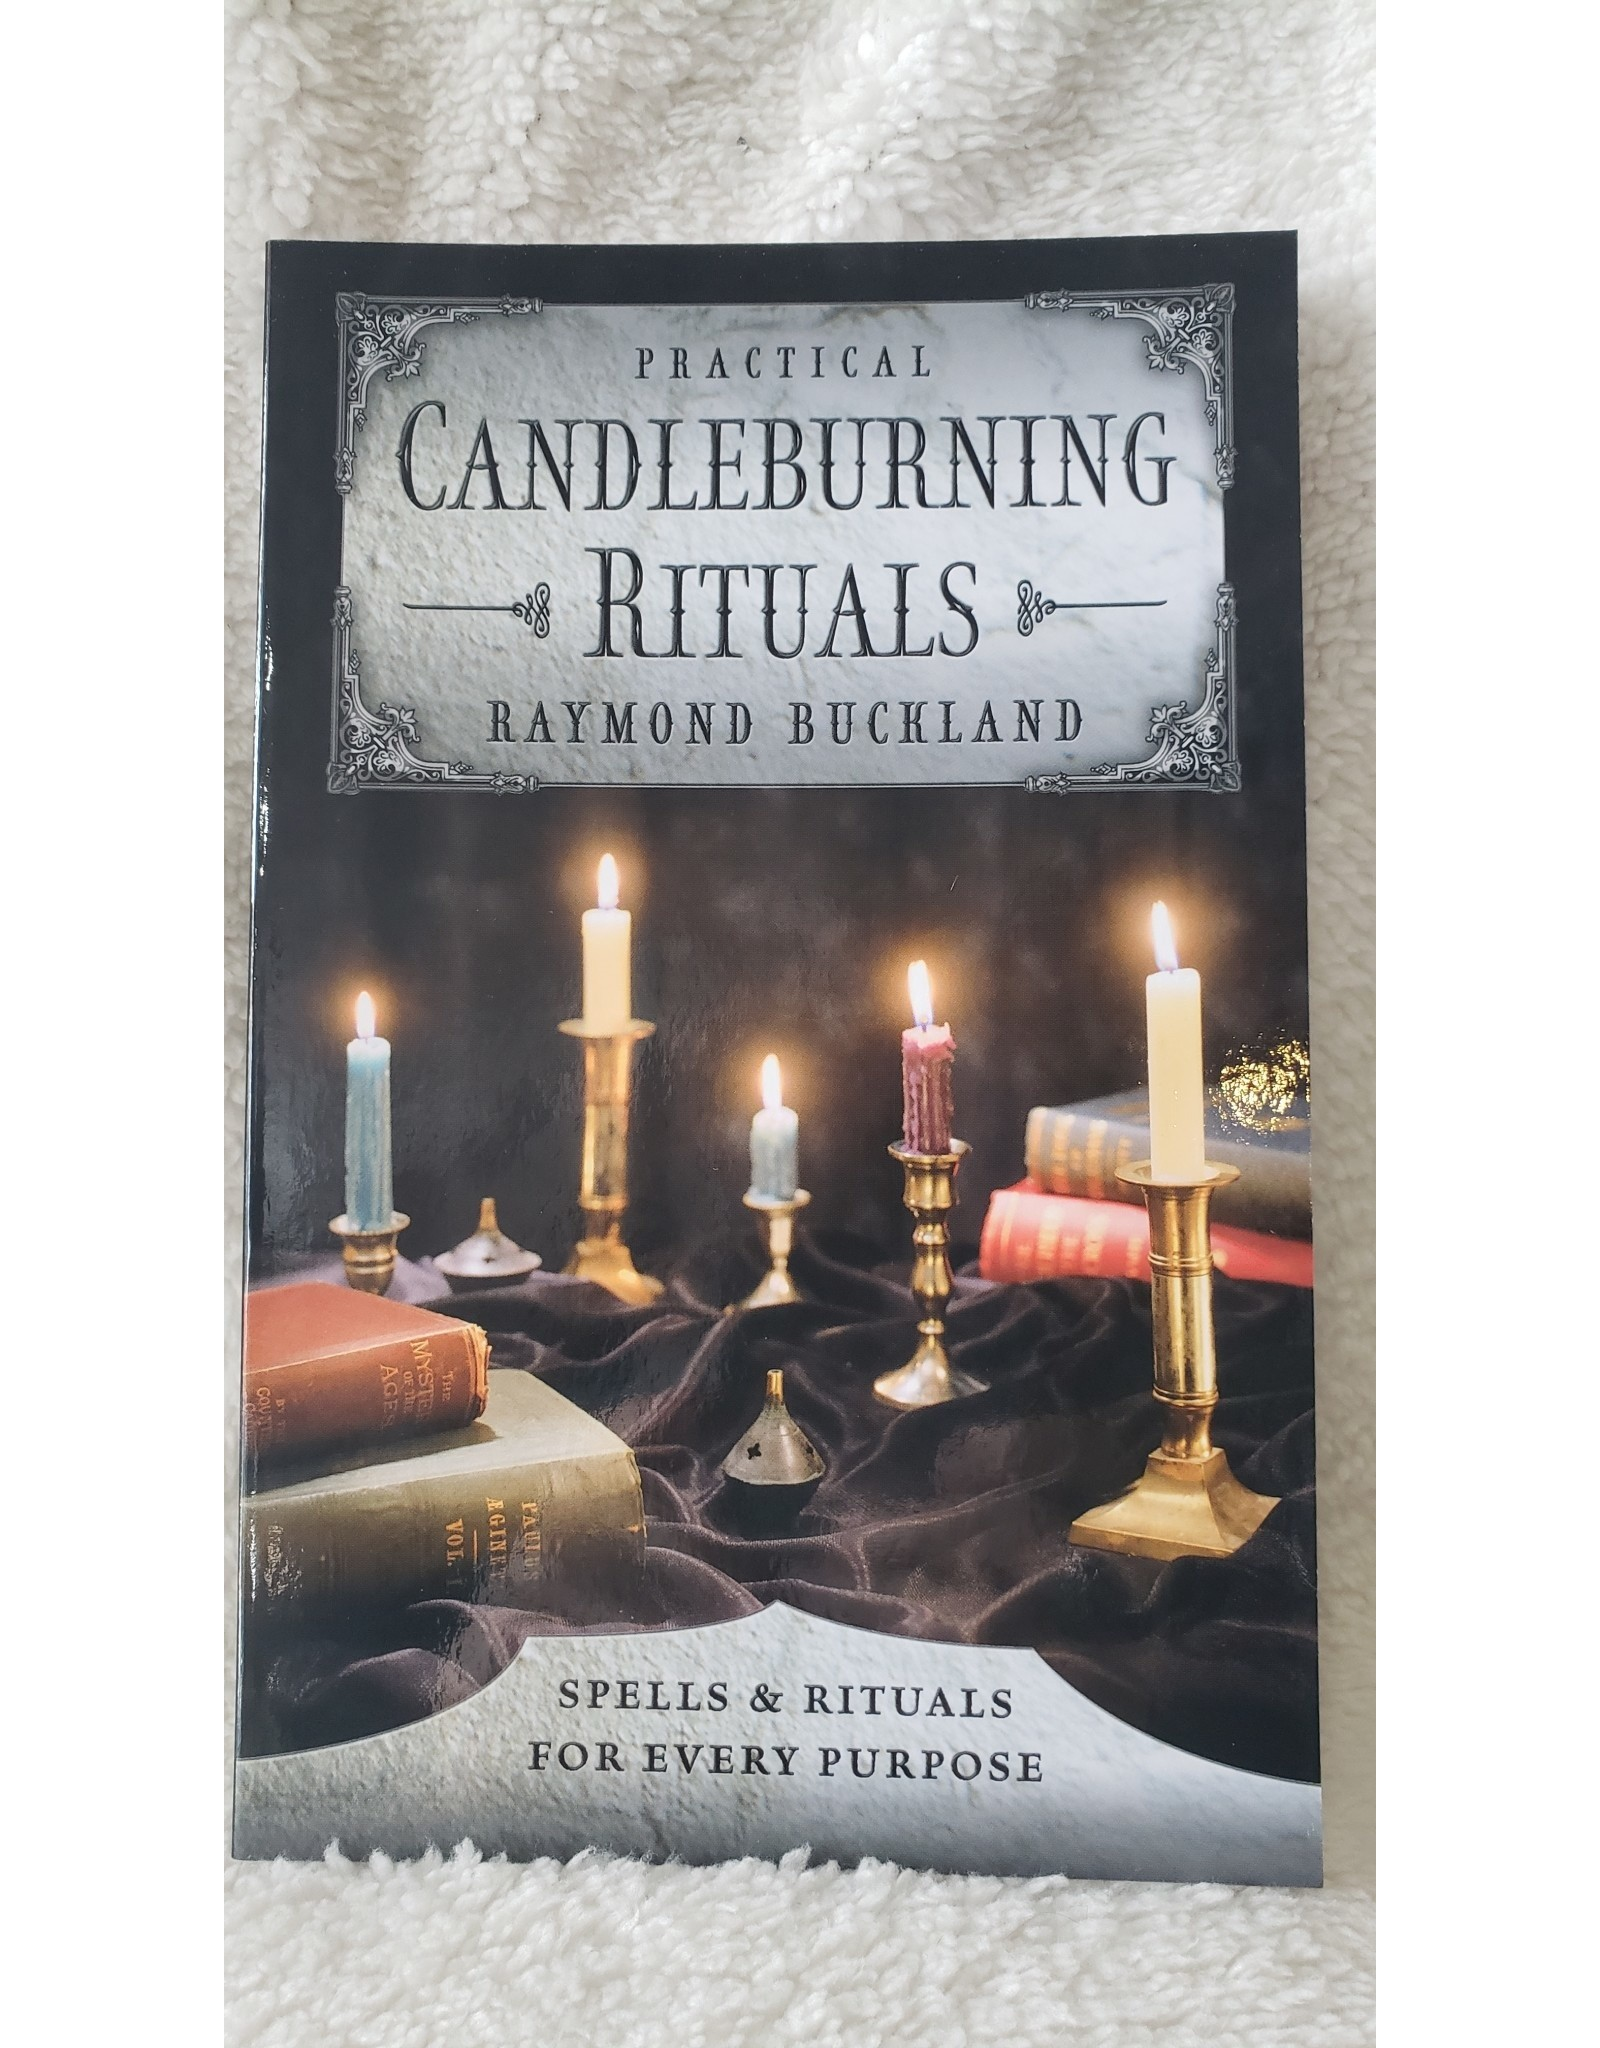 Practical Candle Burning Rituals